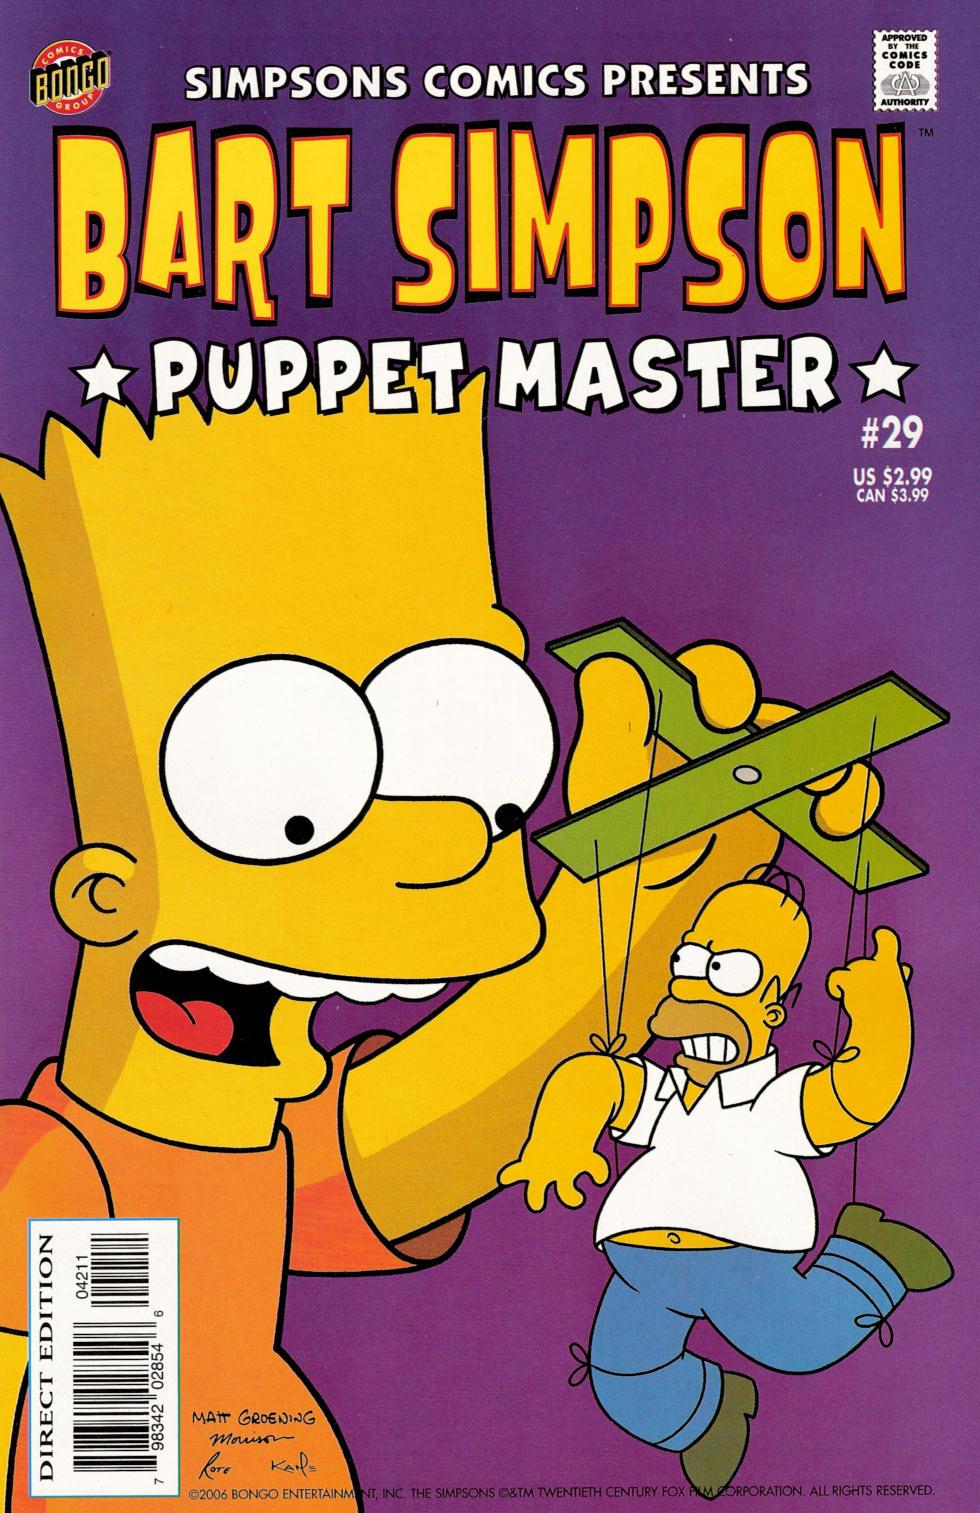 Simpsons Comics Presents Bart Simpson 29 Page 1